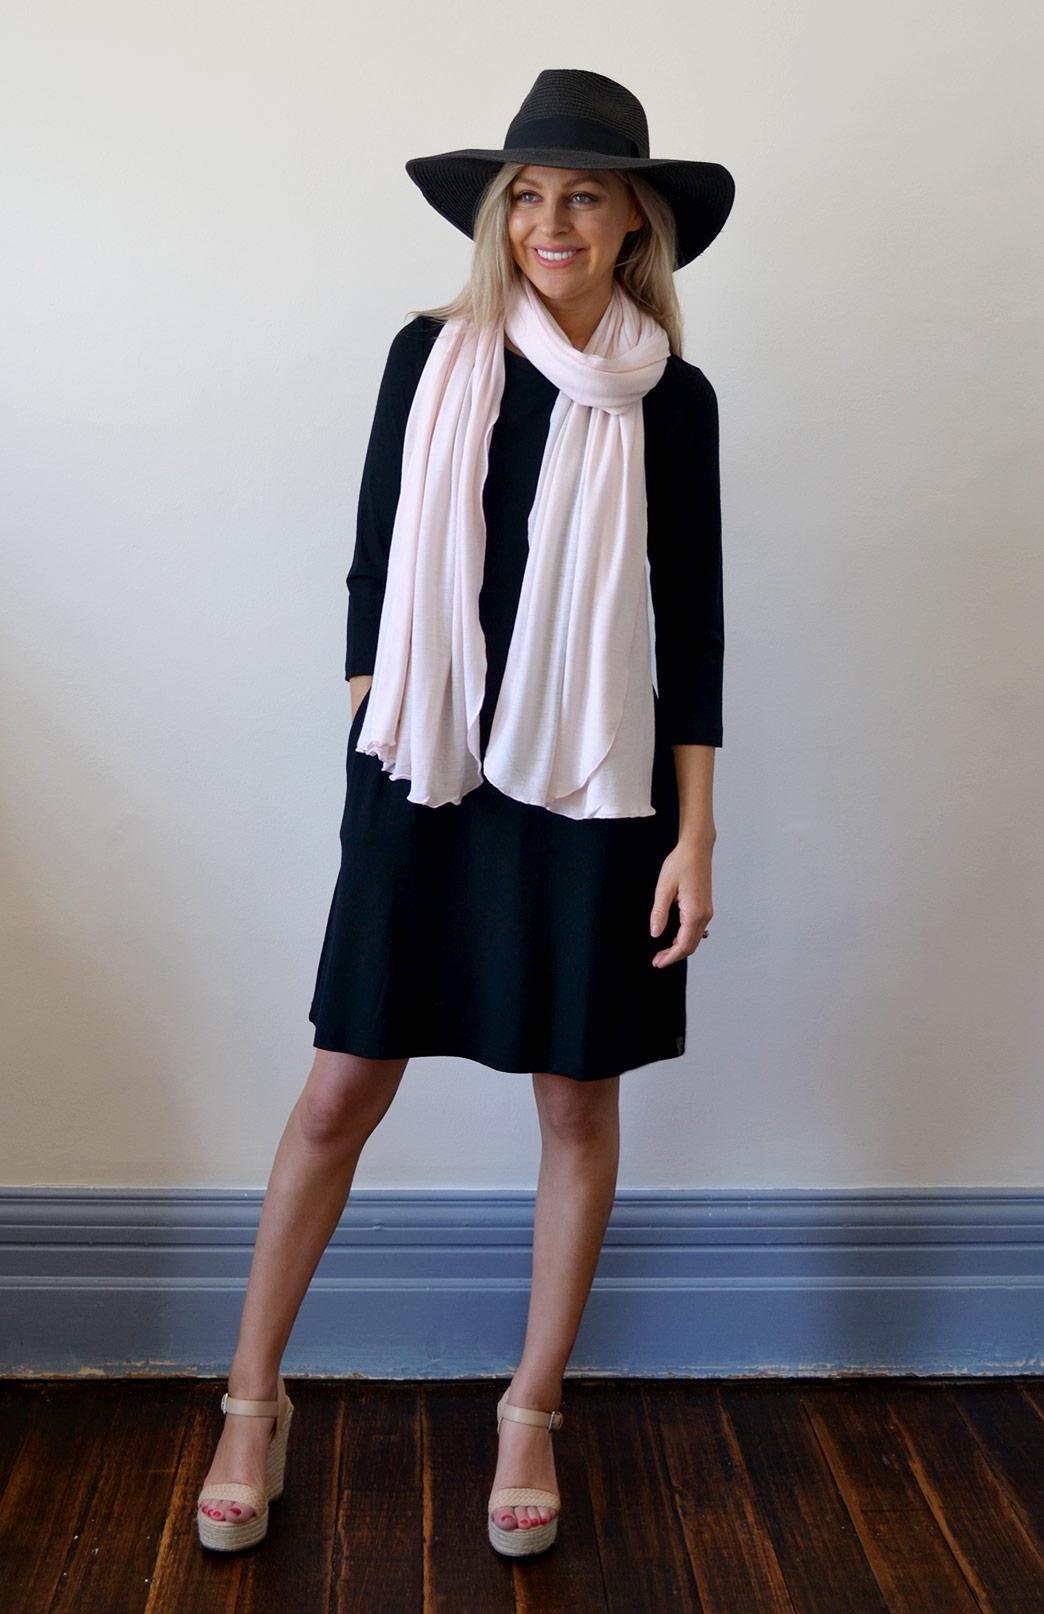 Scarves - Plain - Women's Superfine Blossom Pink Merino Wool Classic Wide Scarf - Smitten Merino Tasmania Australia